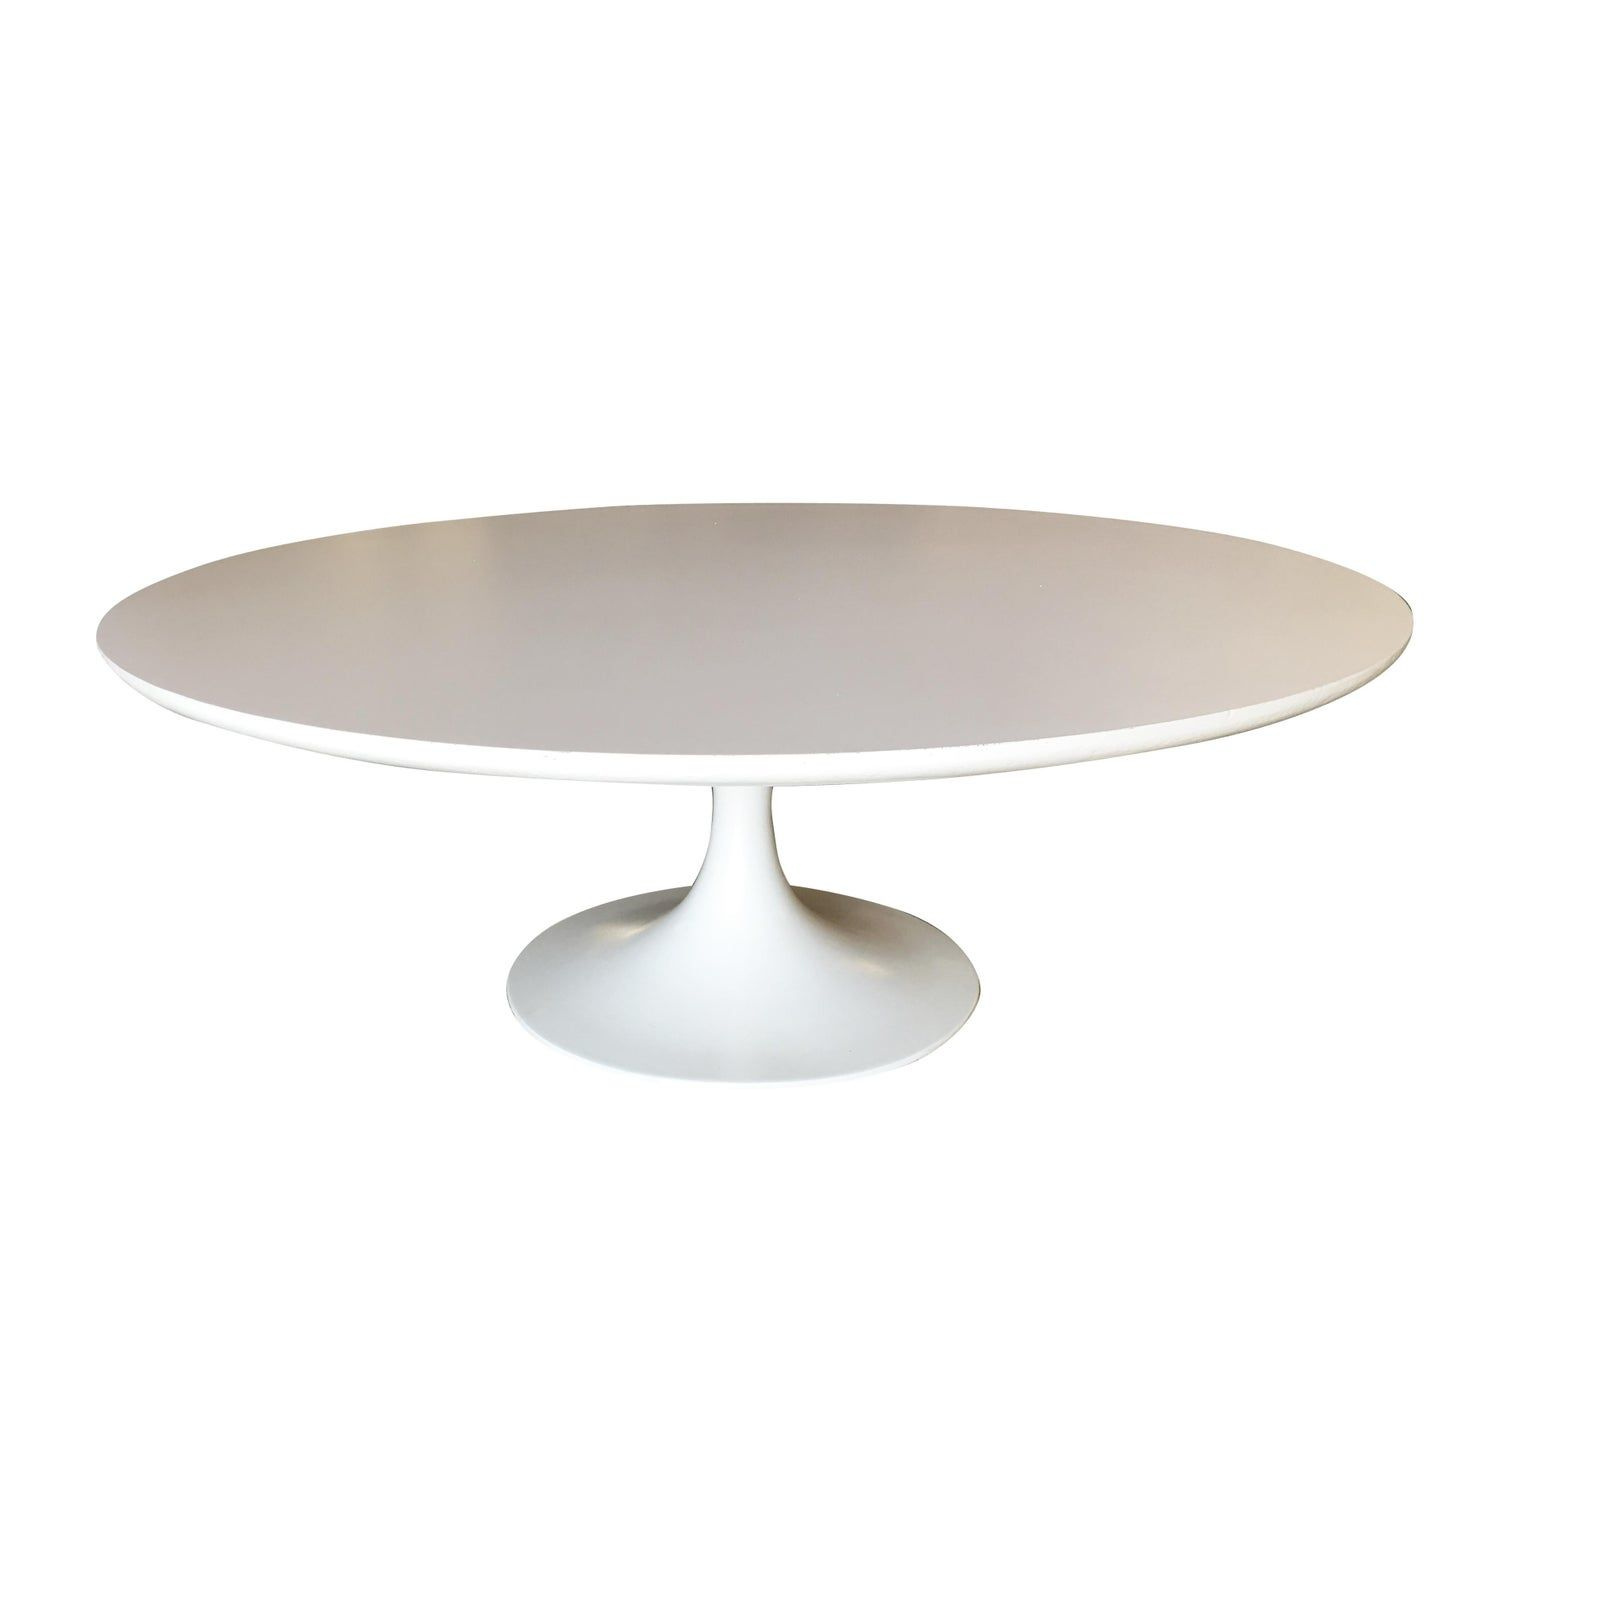 Round 42 Tulip Coffee Table By Eero Saarinen For Knoll Chairish Tulip Coffee Table Coffee Table Coffee Table Design [ 1600 x 1600 Pixel ]